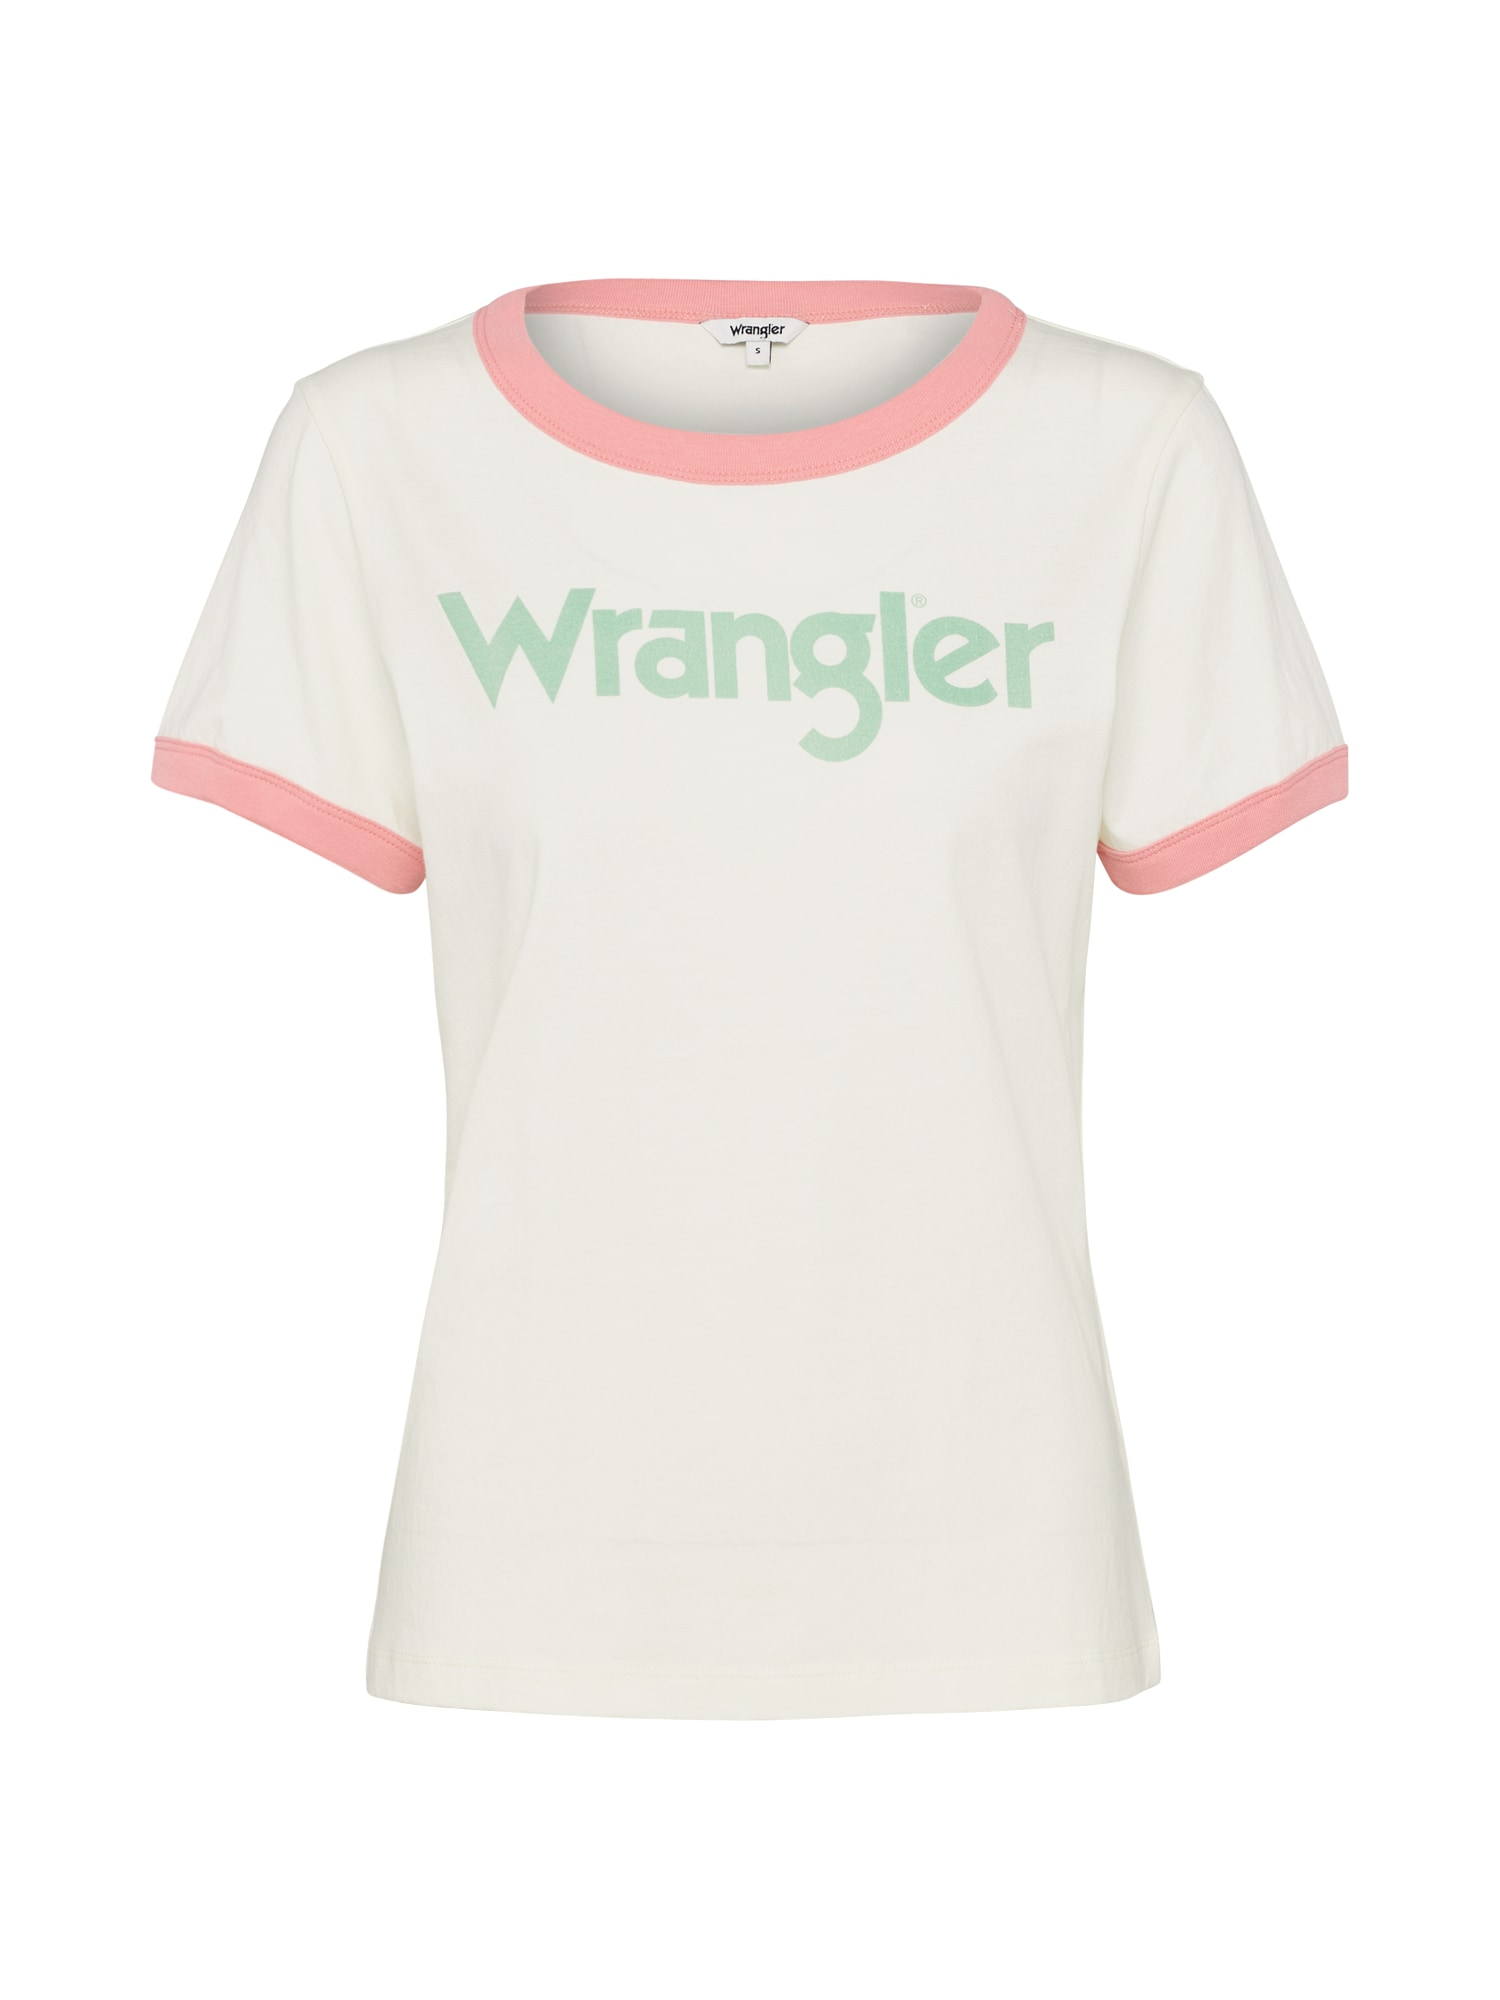 WRANGLER Dames Shirt RETRO KABEL crème lichtgroen lichtroze